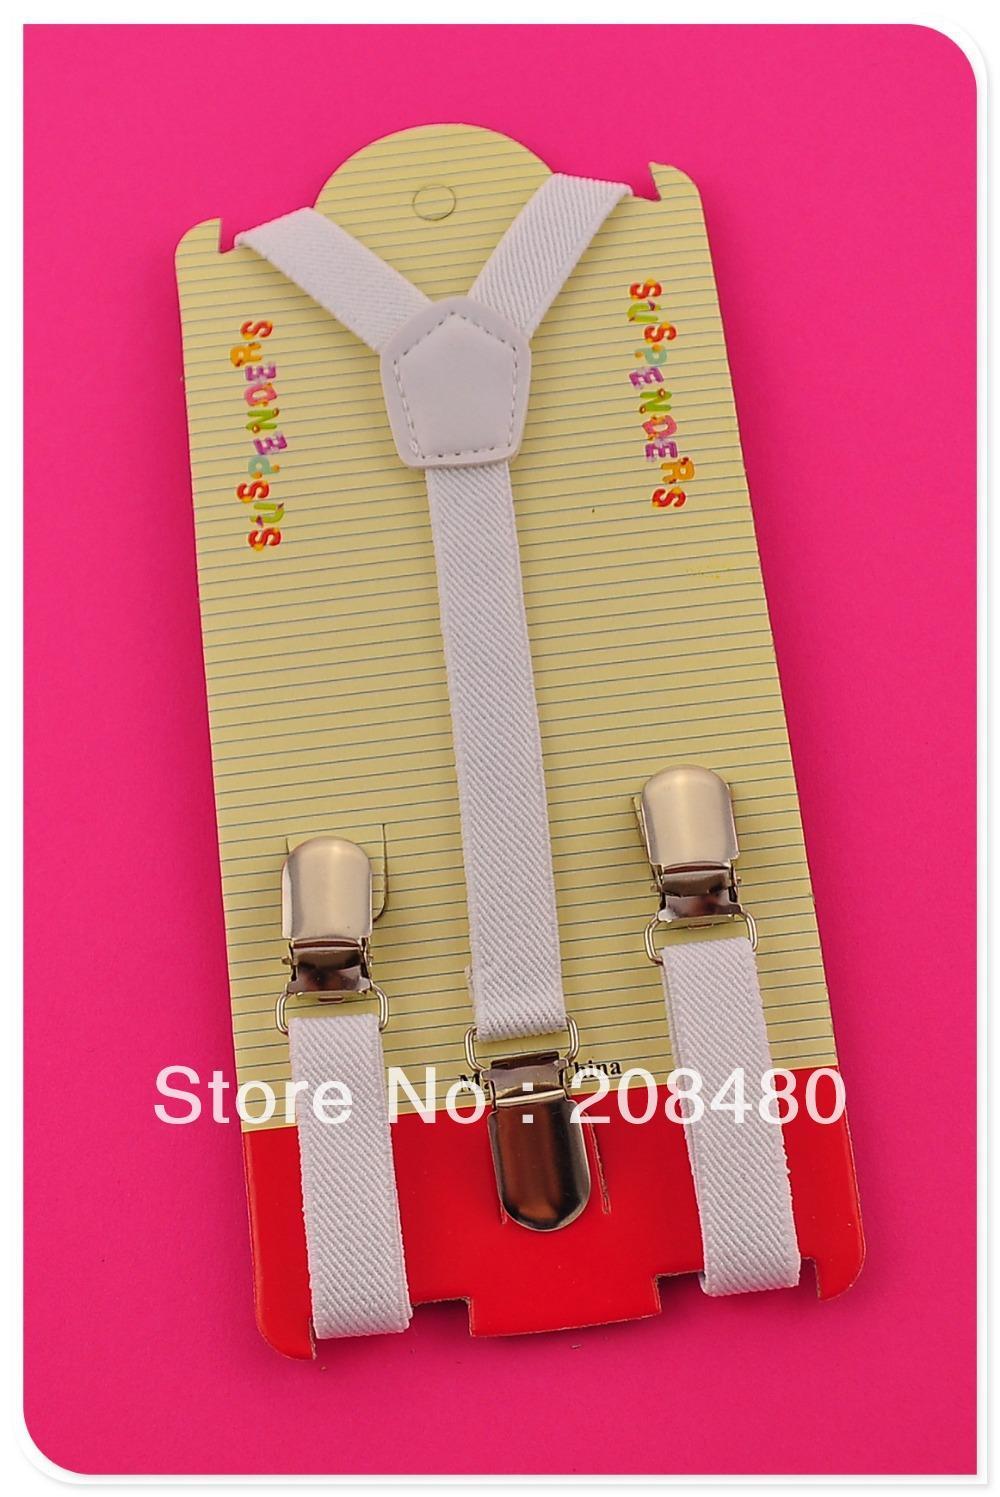 Free Shipping-1.5x65cm White Kids Suspenders Children/Boys/Girls Suspender Elastic Braces Slim Suspenders-Wholesale & Retail